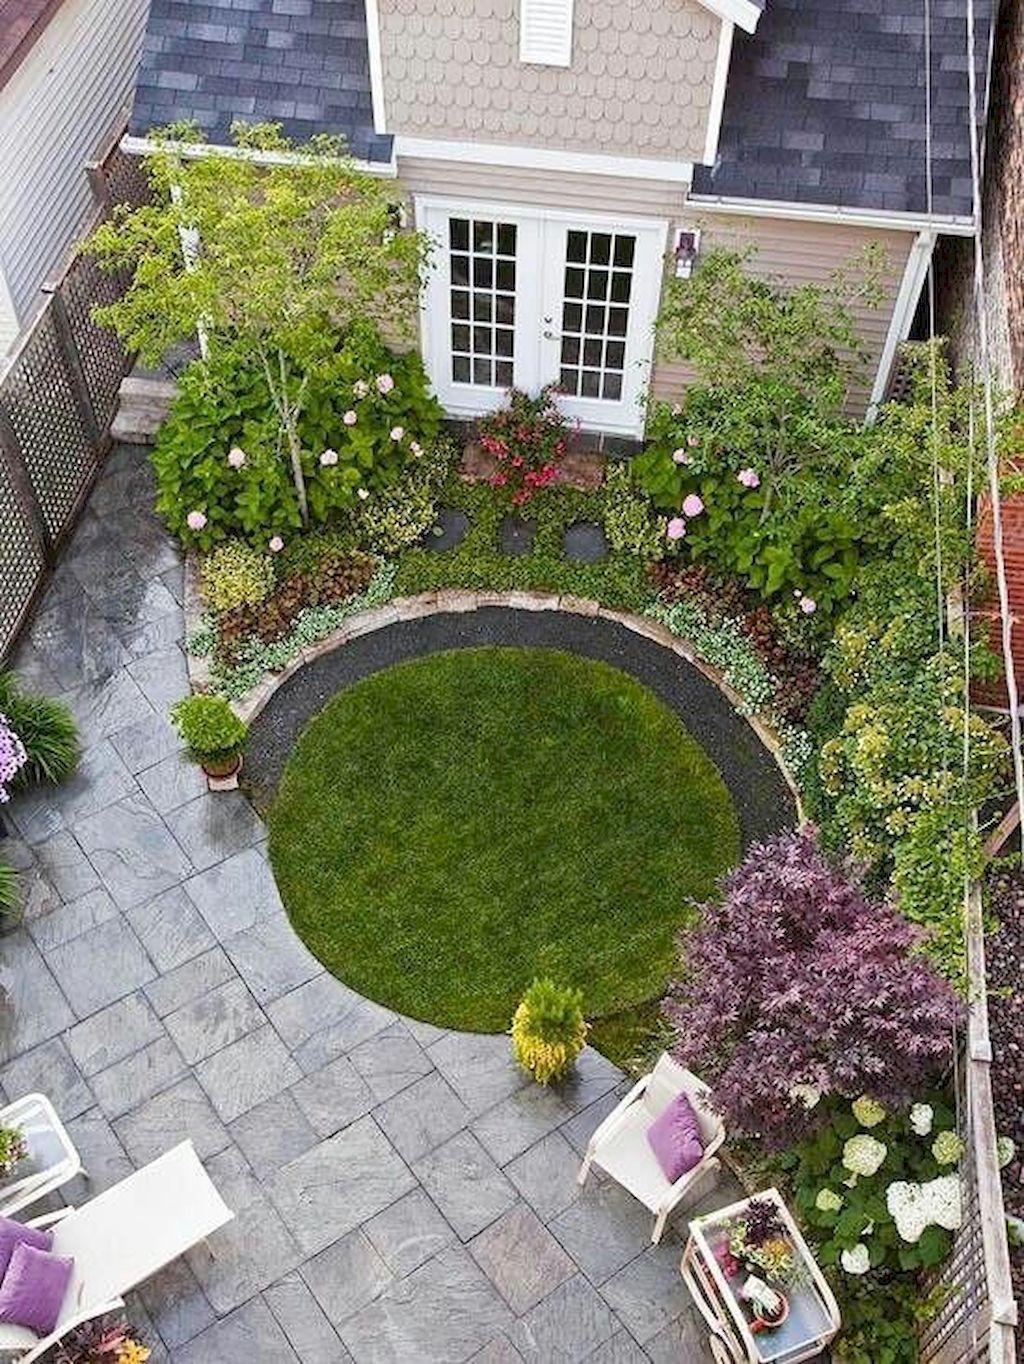 New Low Maintenance Backyard Ideas